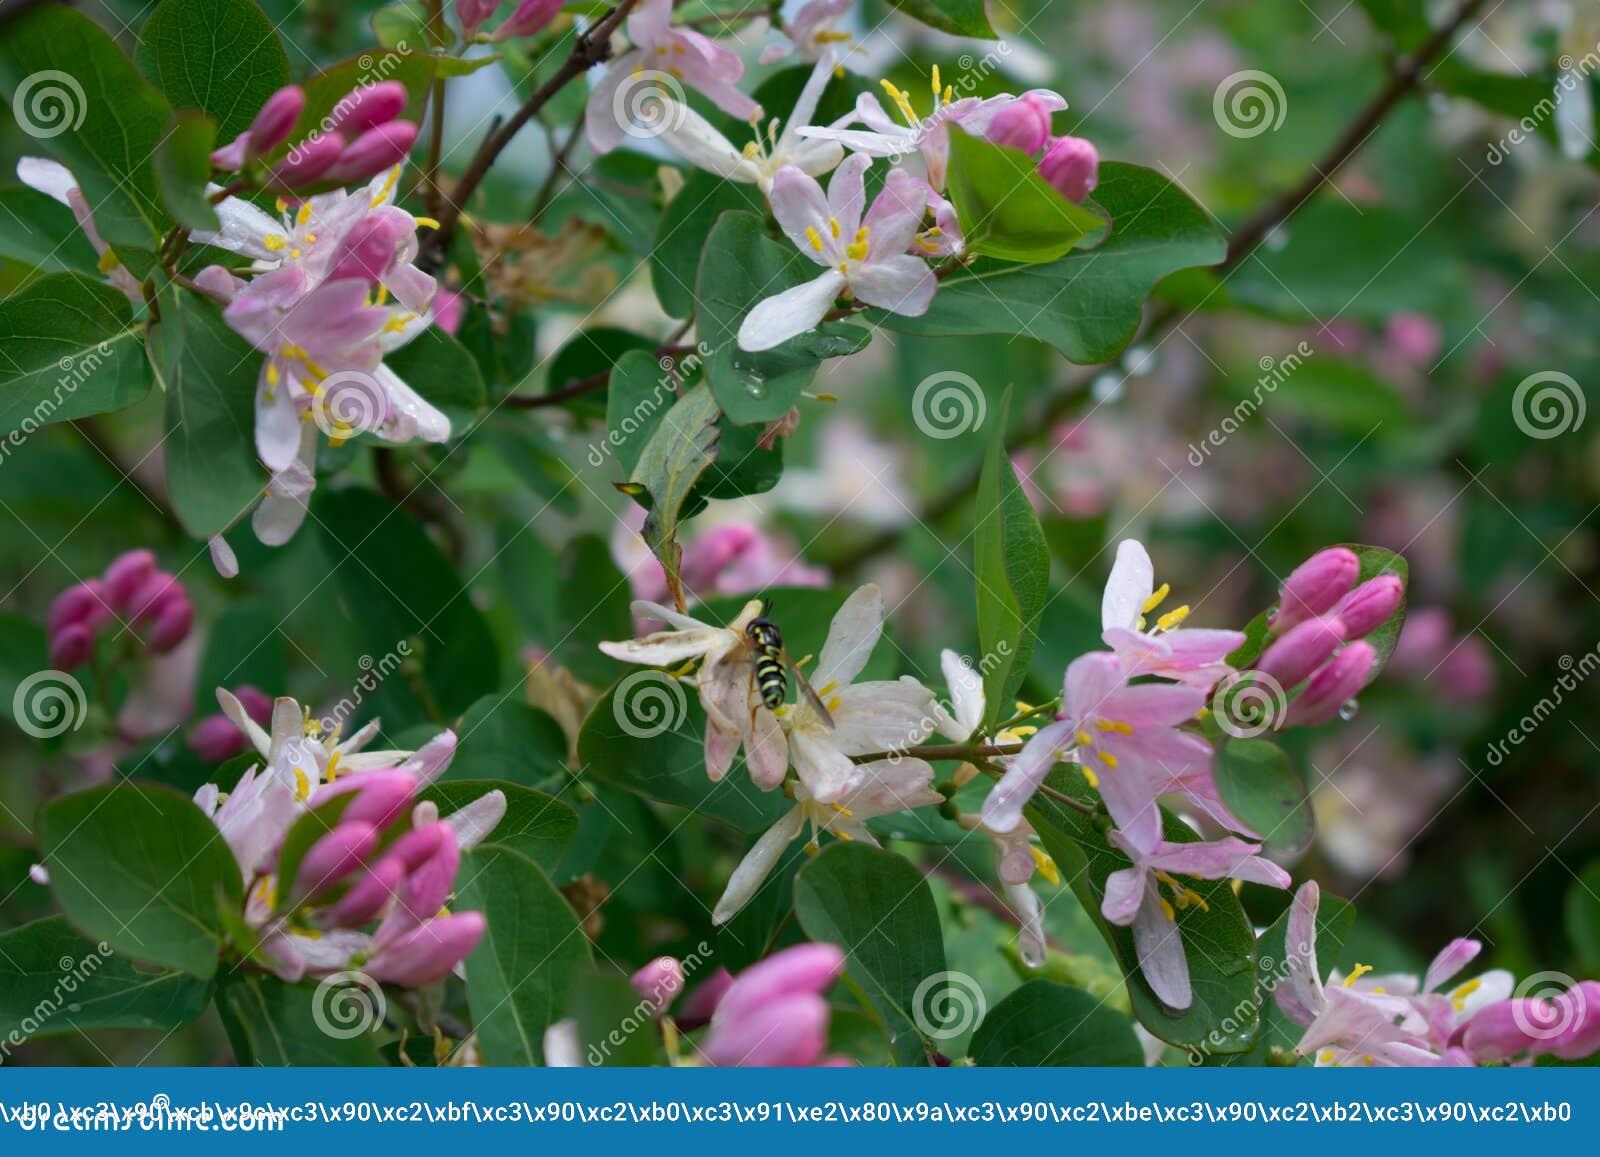 忍冬属korolkowii/忍冬属植物/wasp在花